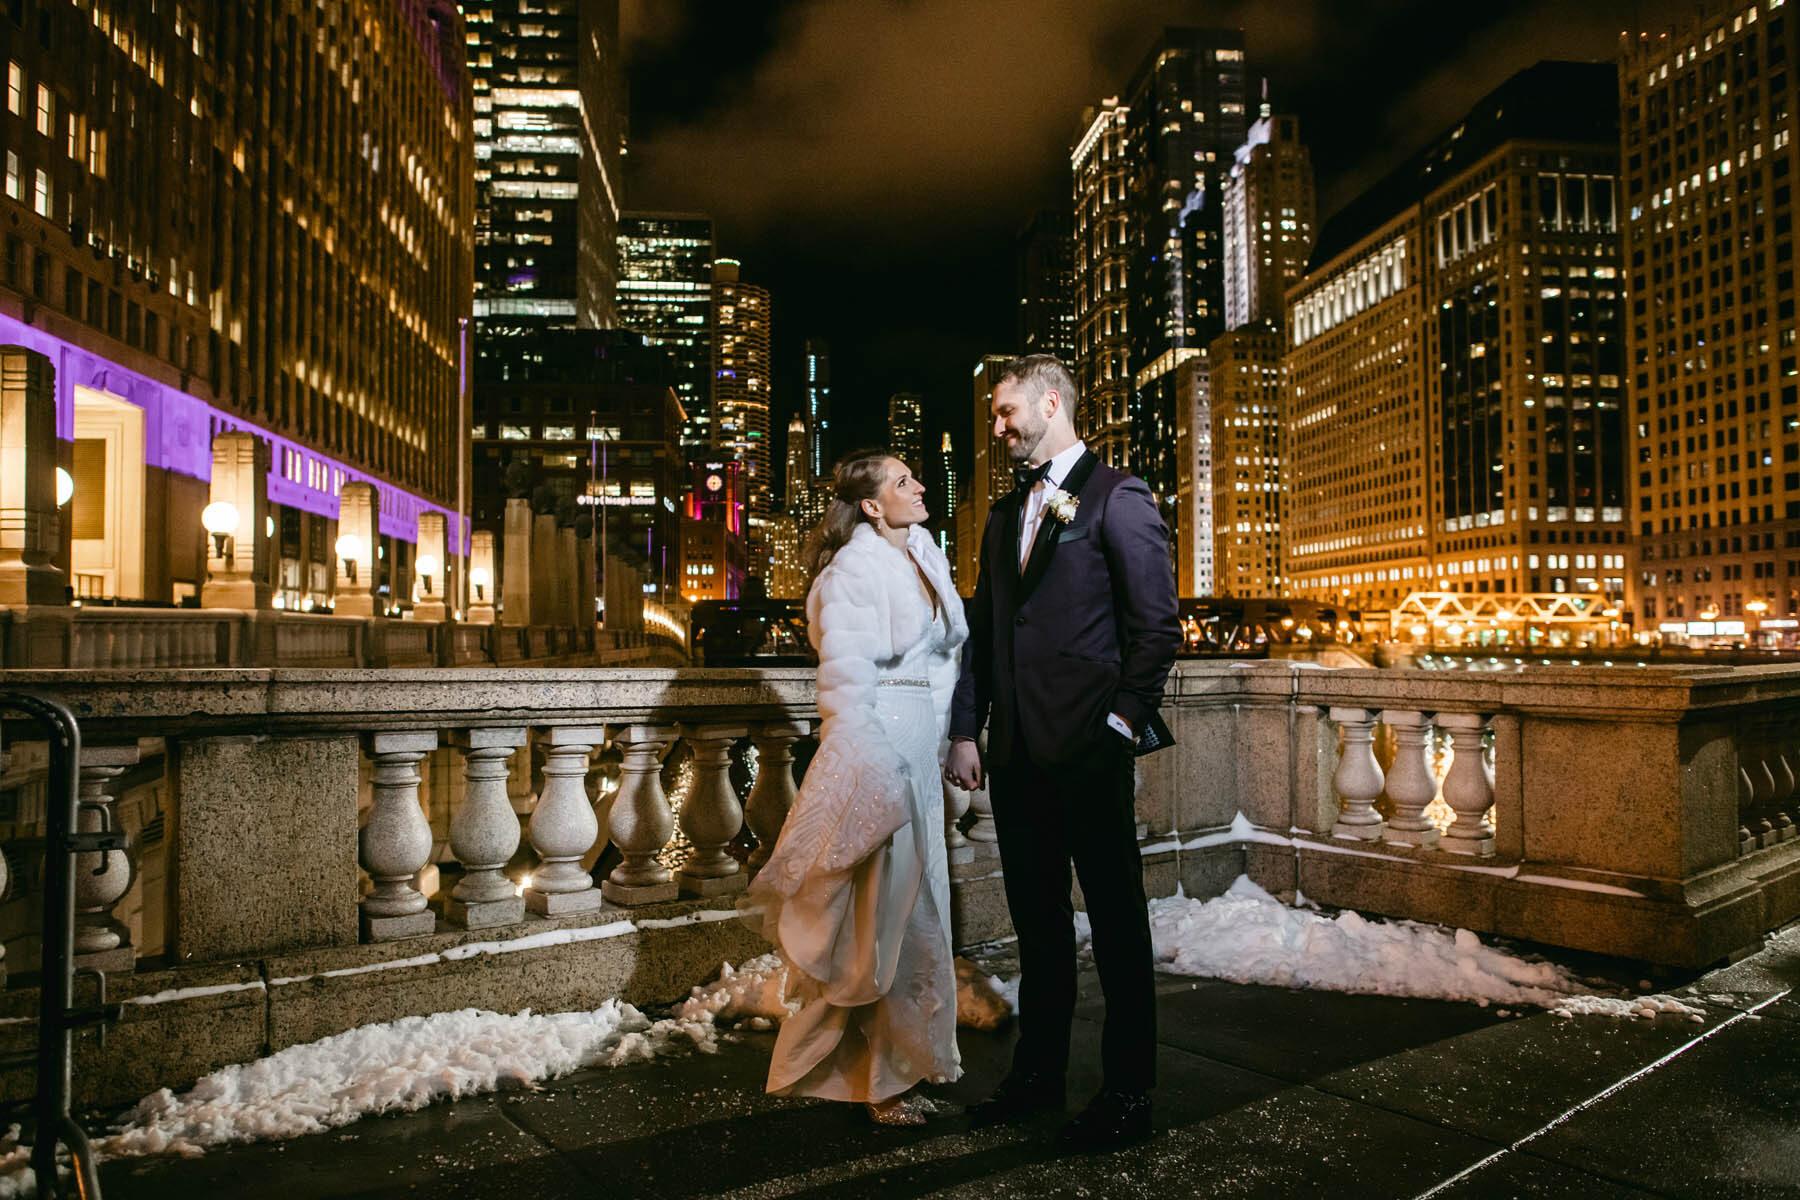 Chicago Riverwalk Night Wedding Photo